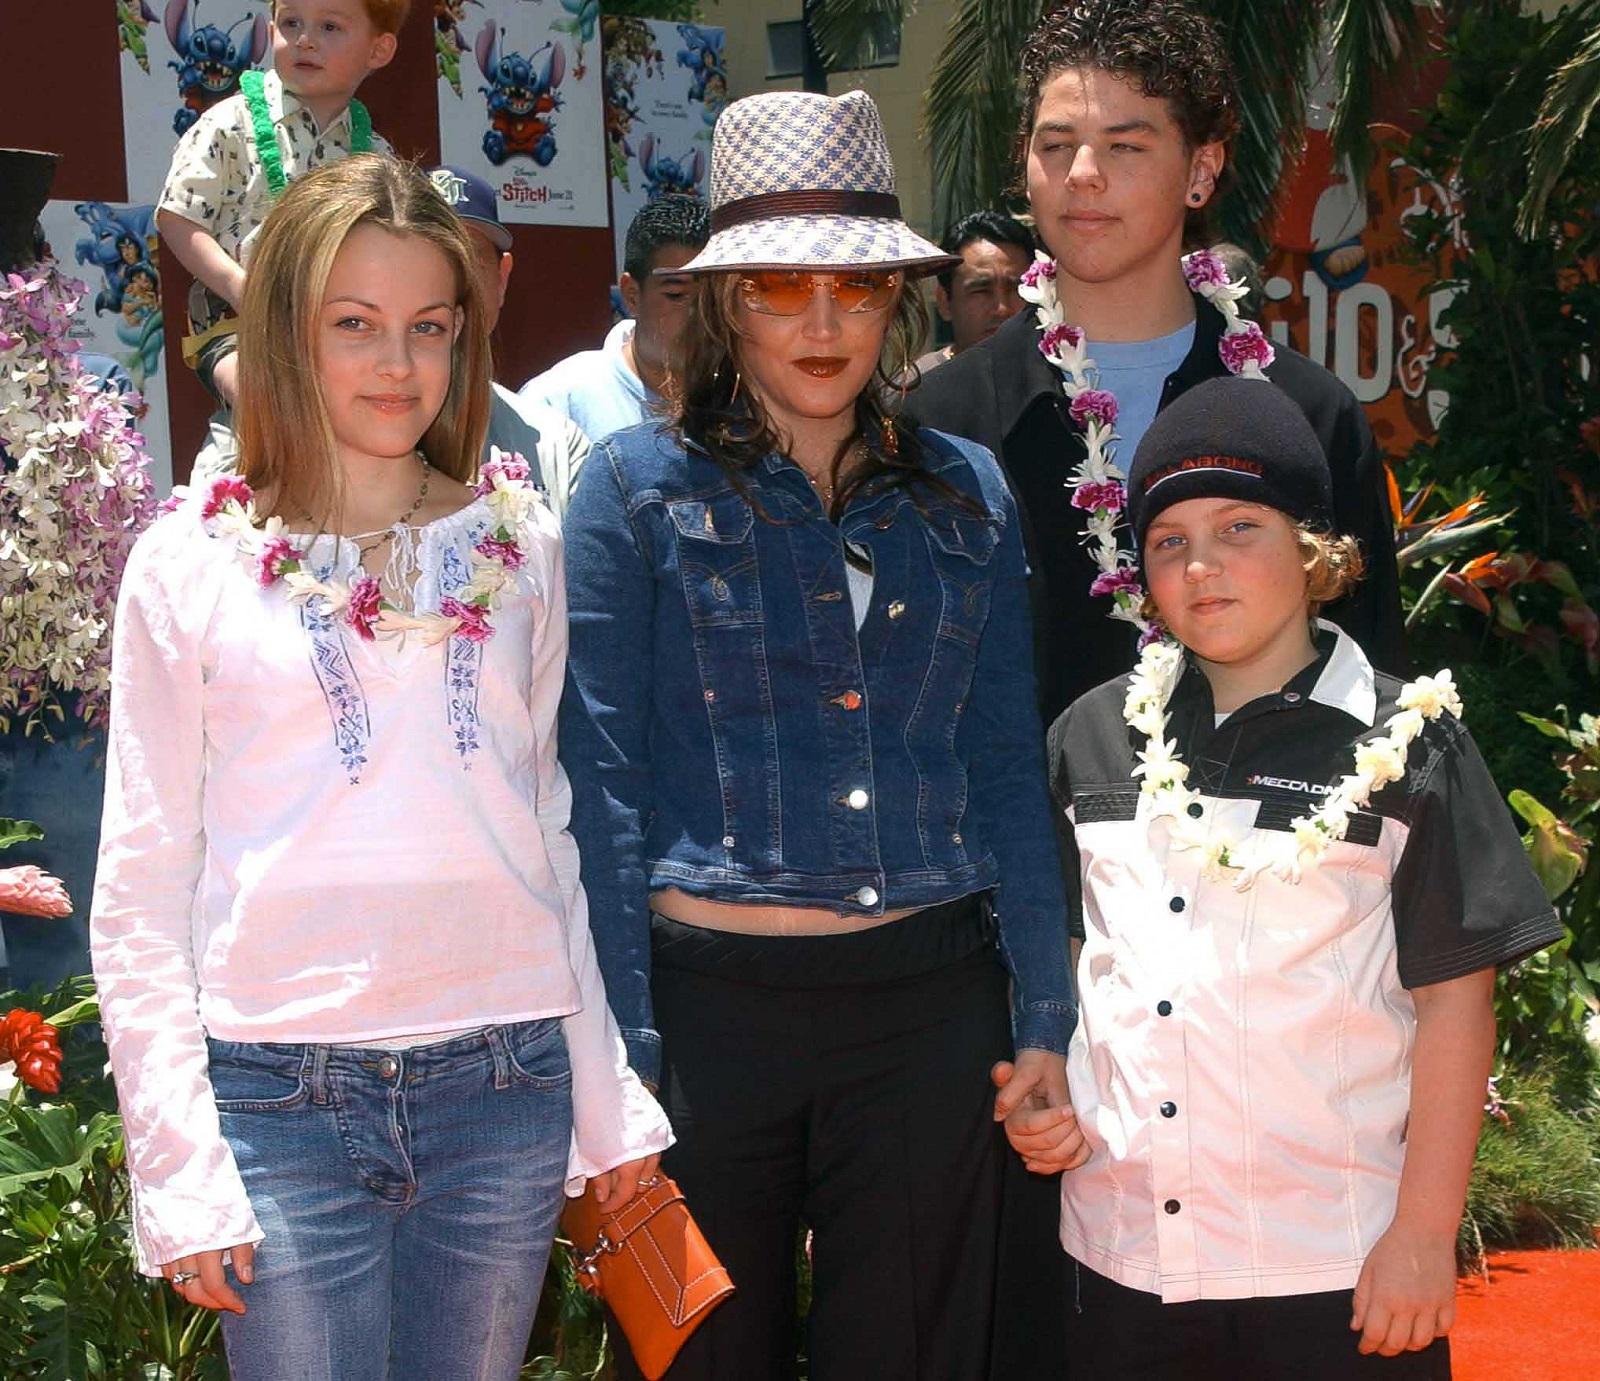 Lisa Marie Presley and her children Benjamin Keough (R), Riley Keough (L), and her half-brother Navarone Garibaldi